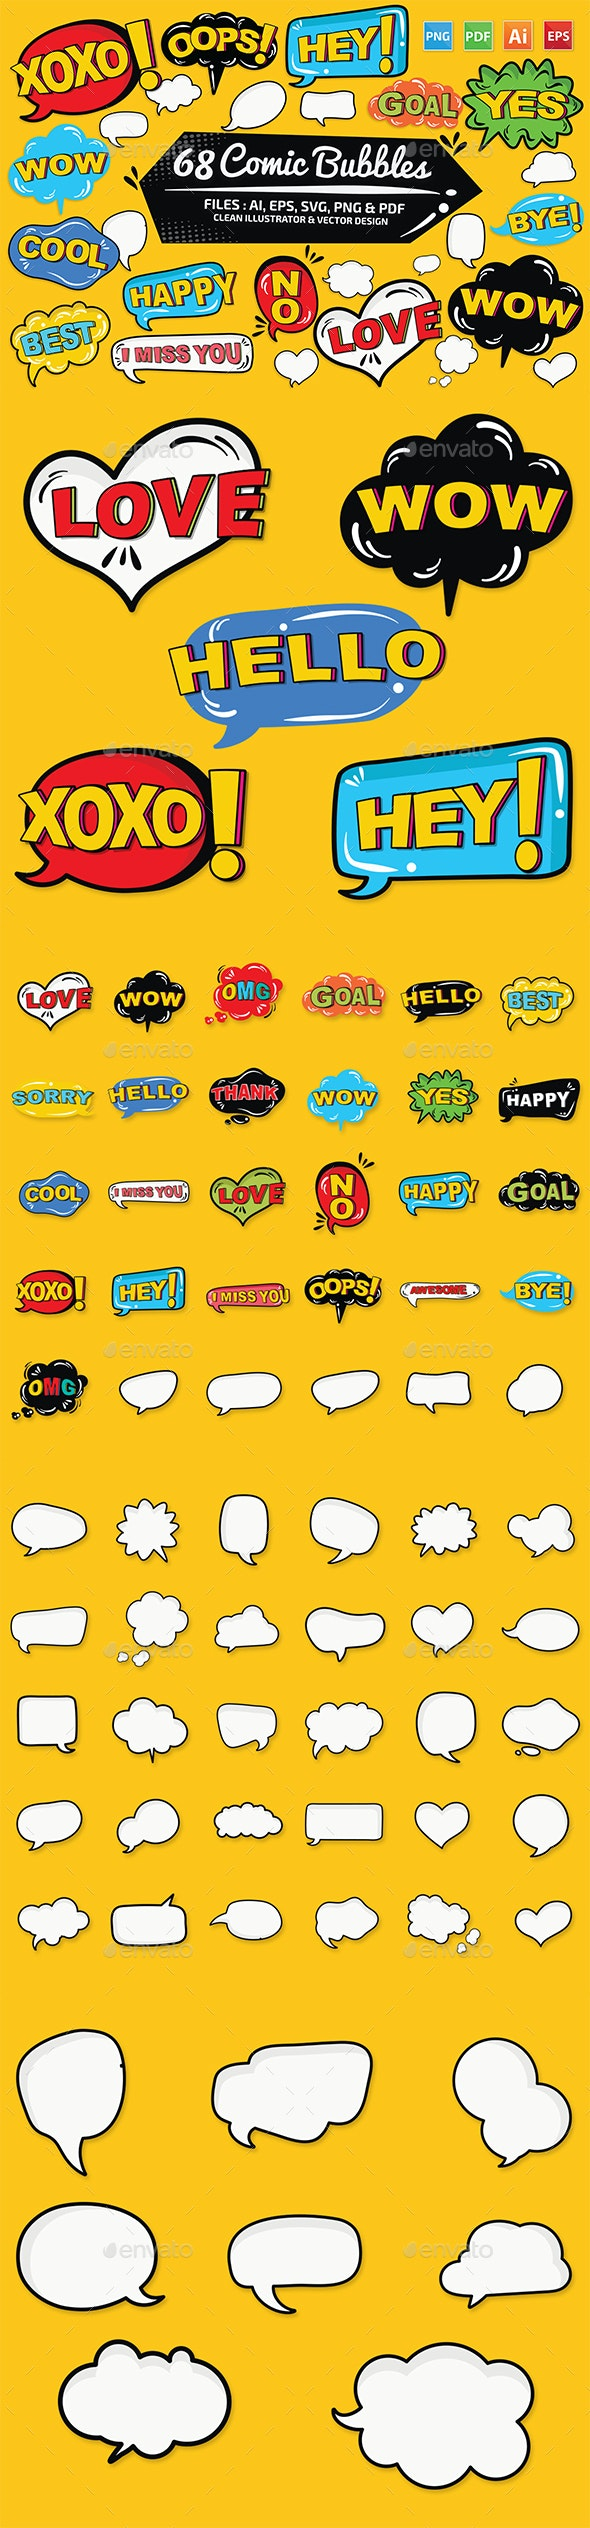 68 Comic Bubble Design - Vectors